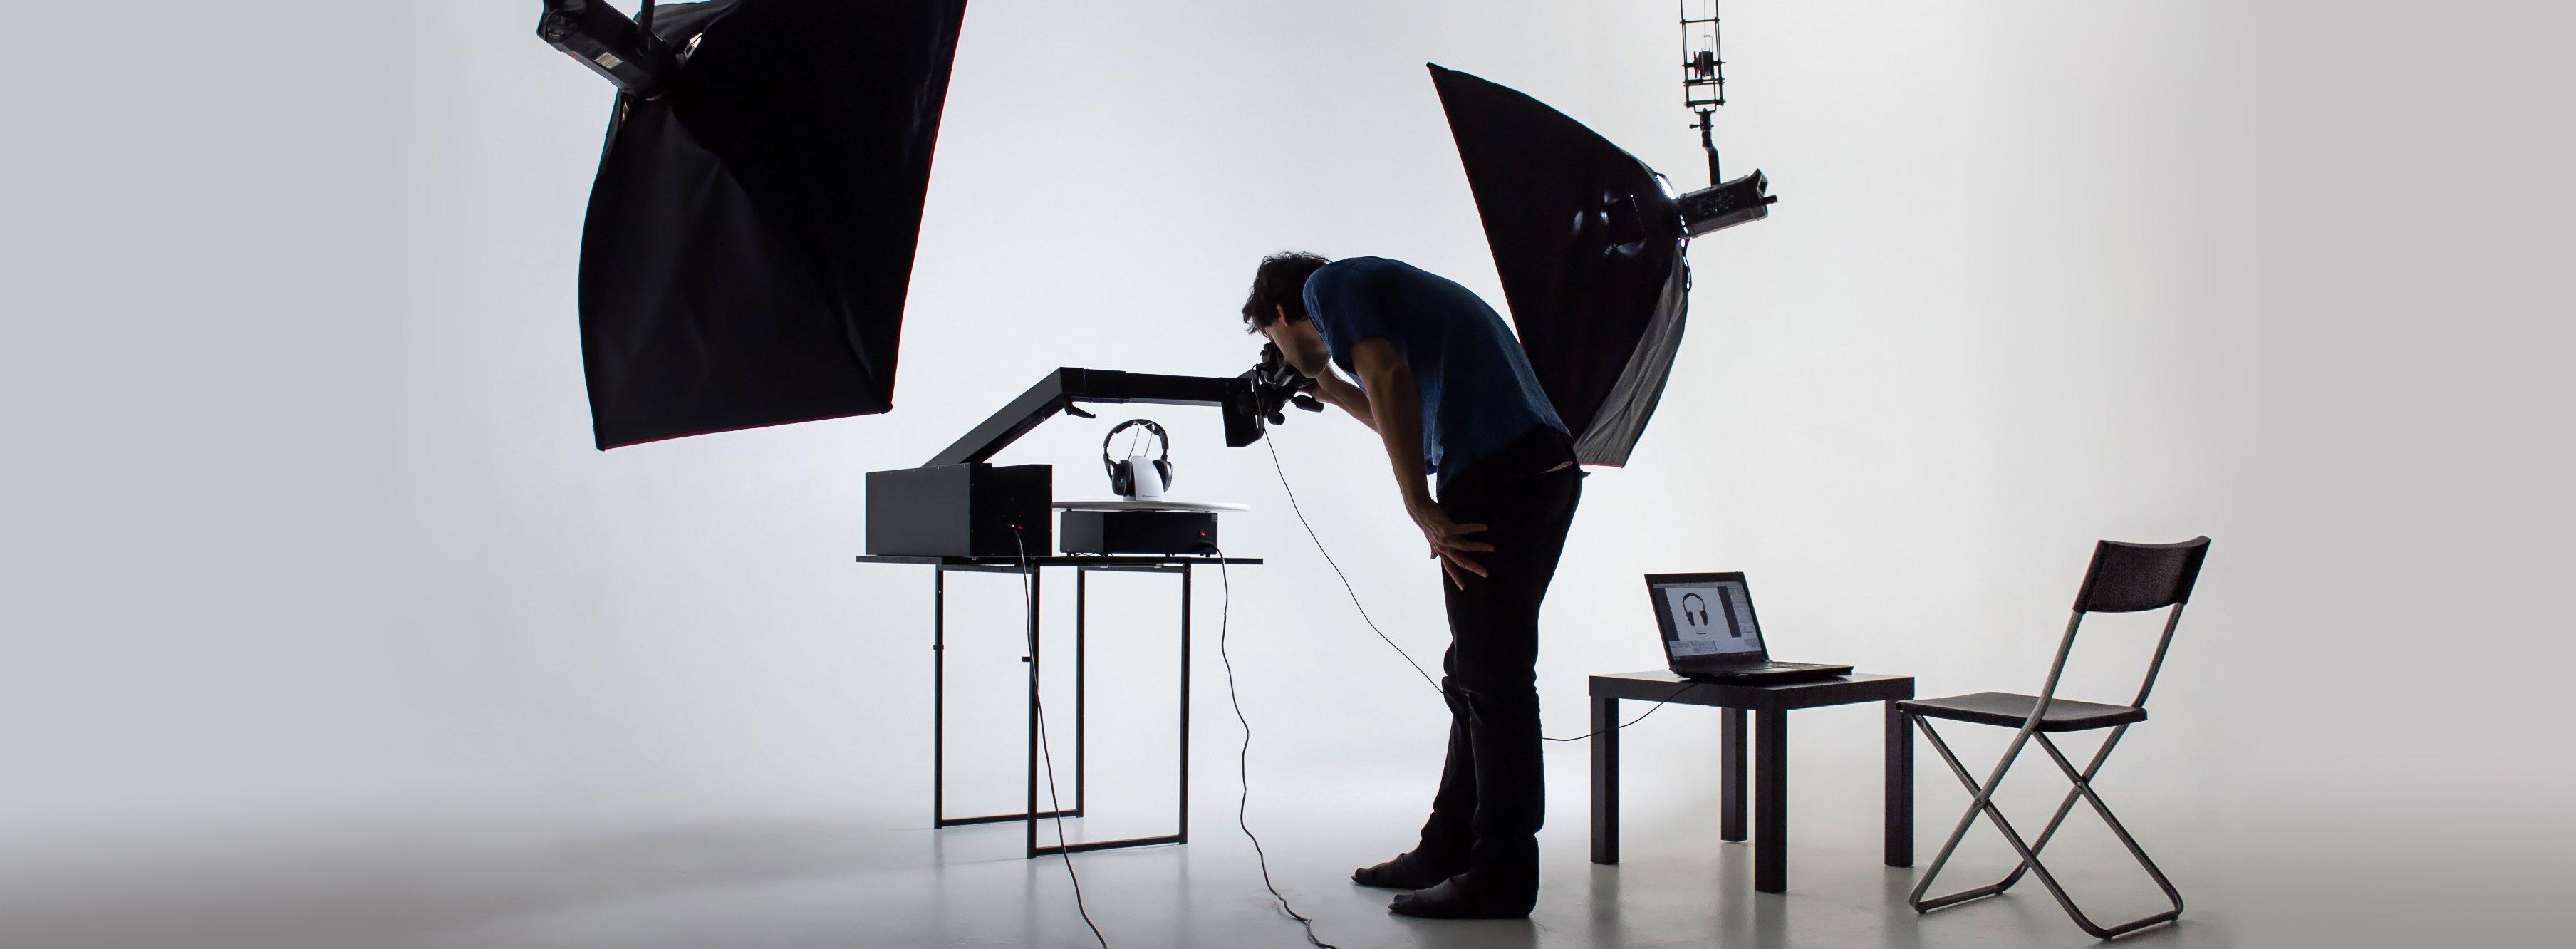 Мозг, видео, фото, VR, 3D и конверсия будущее визуализации в интернет-торговле